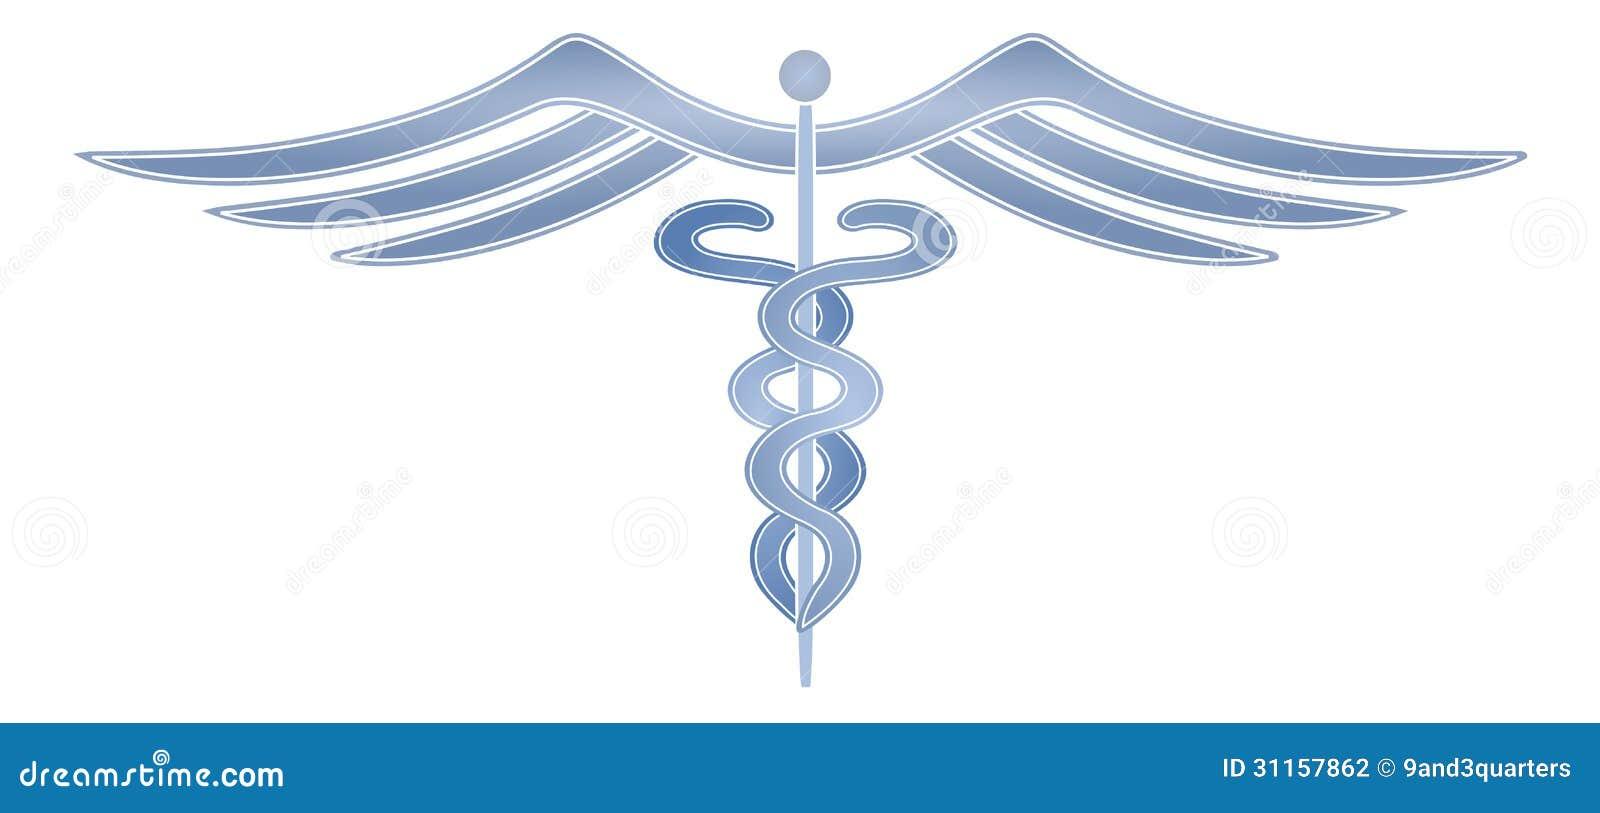 Modern Medical Cadeceus Stock Photography Image 31157862